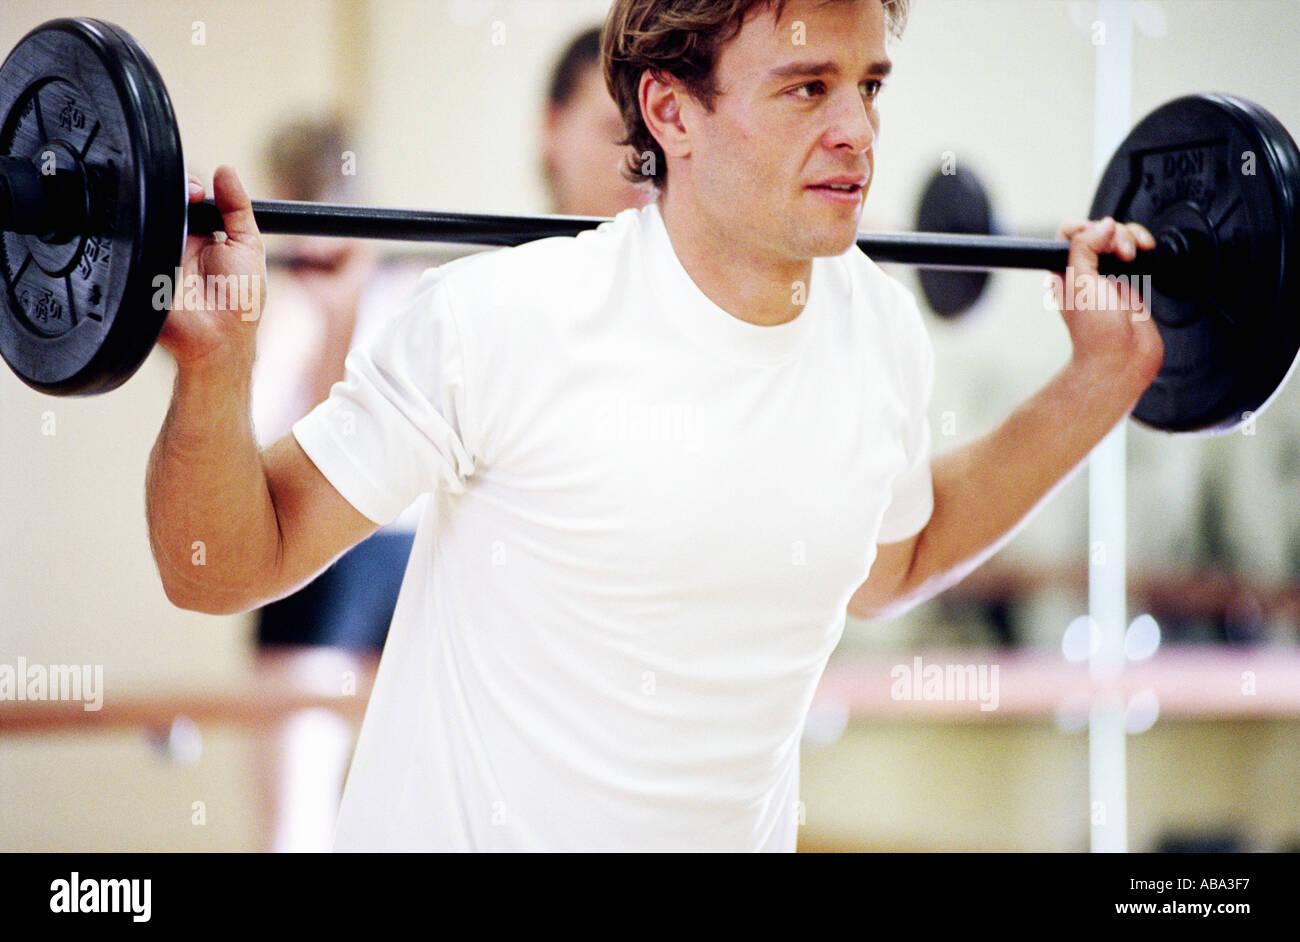 Man weight lifting - Stock Image